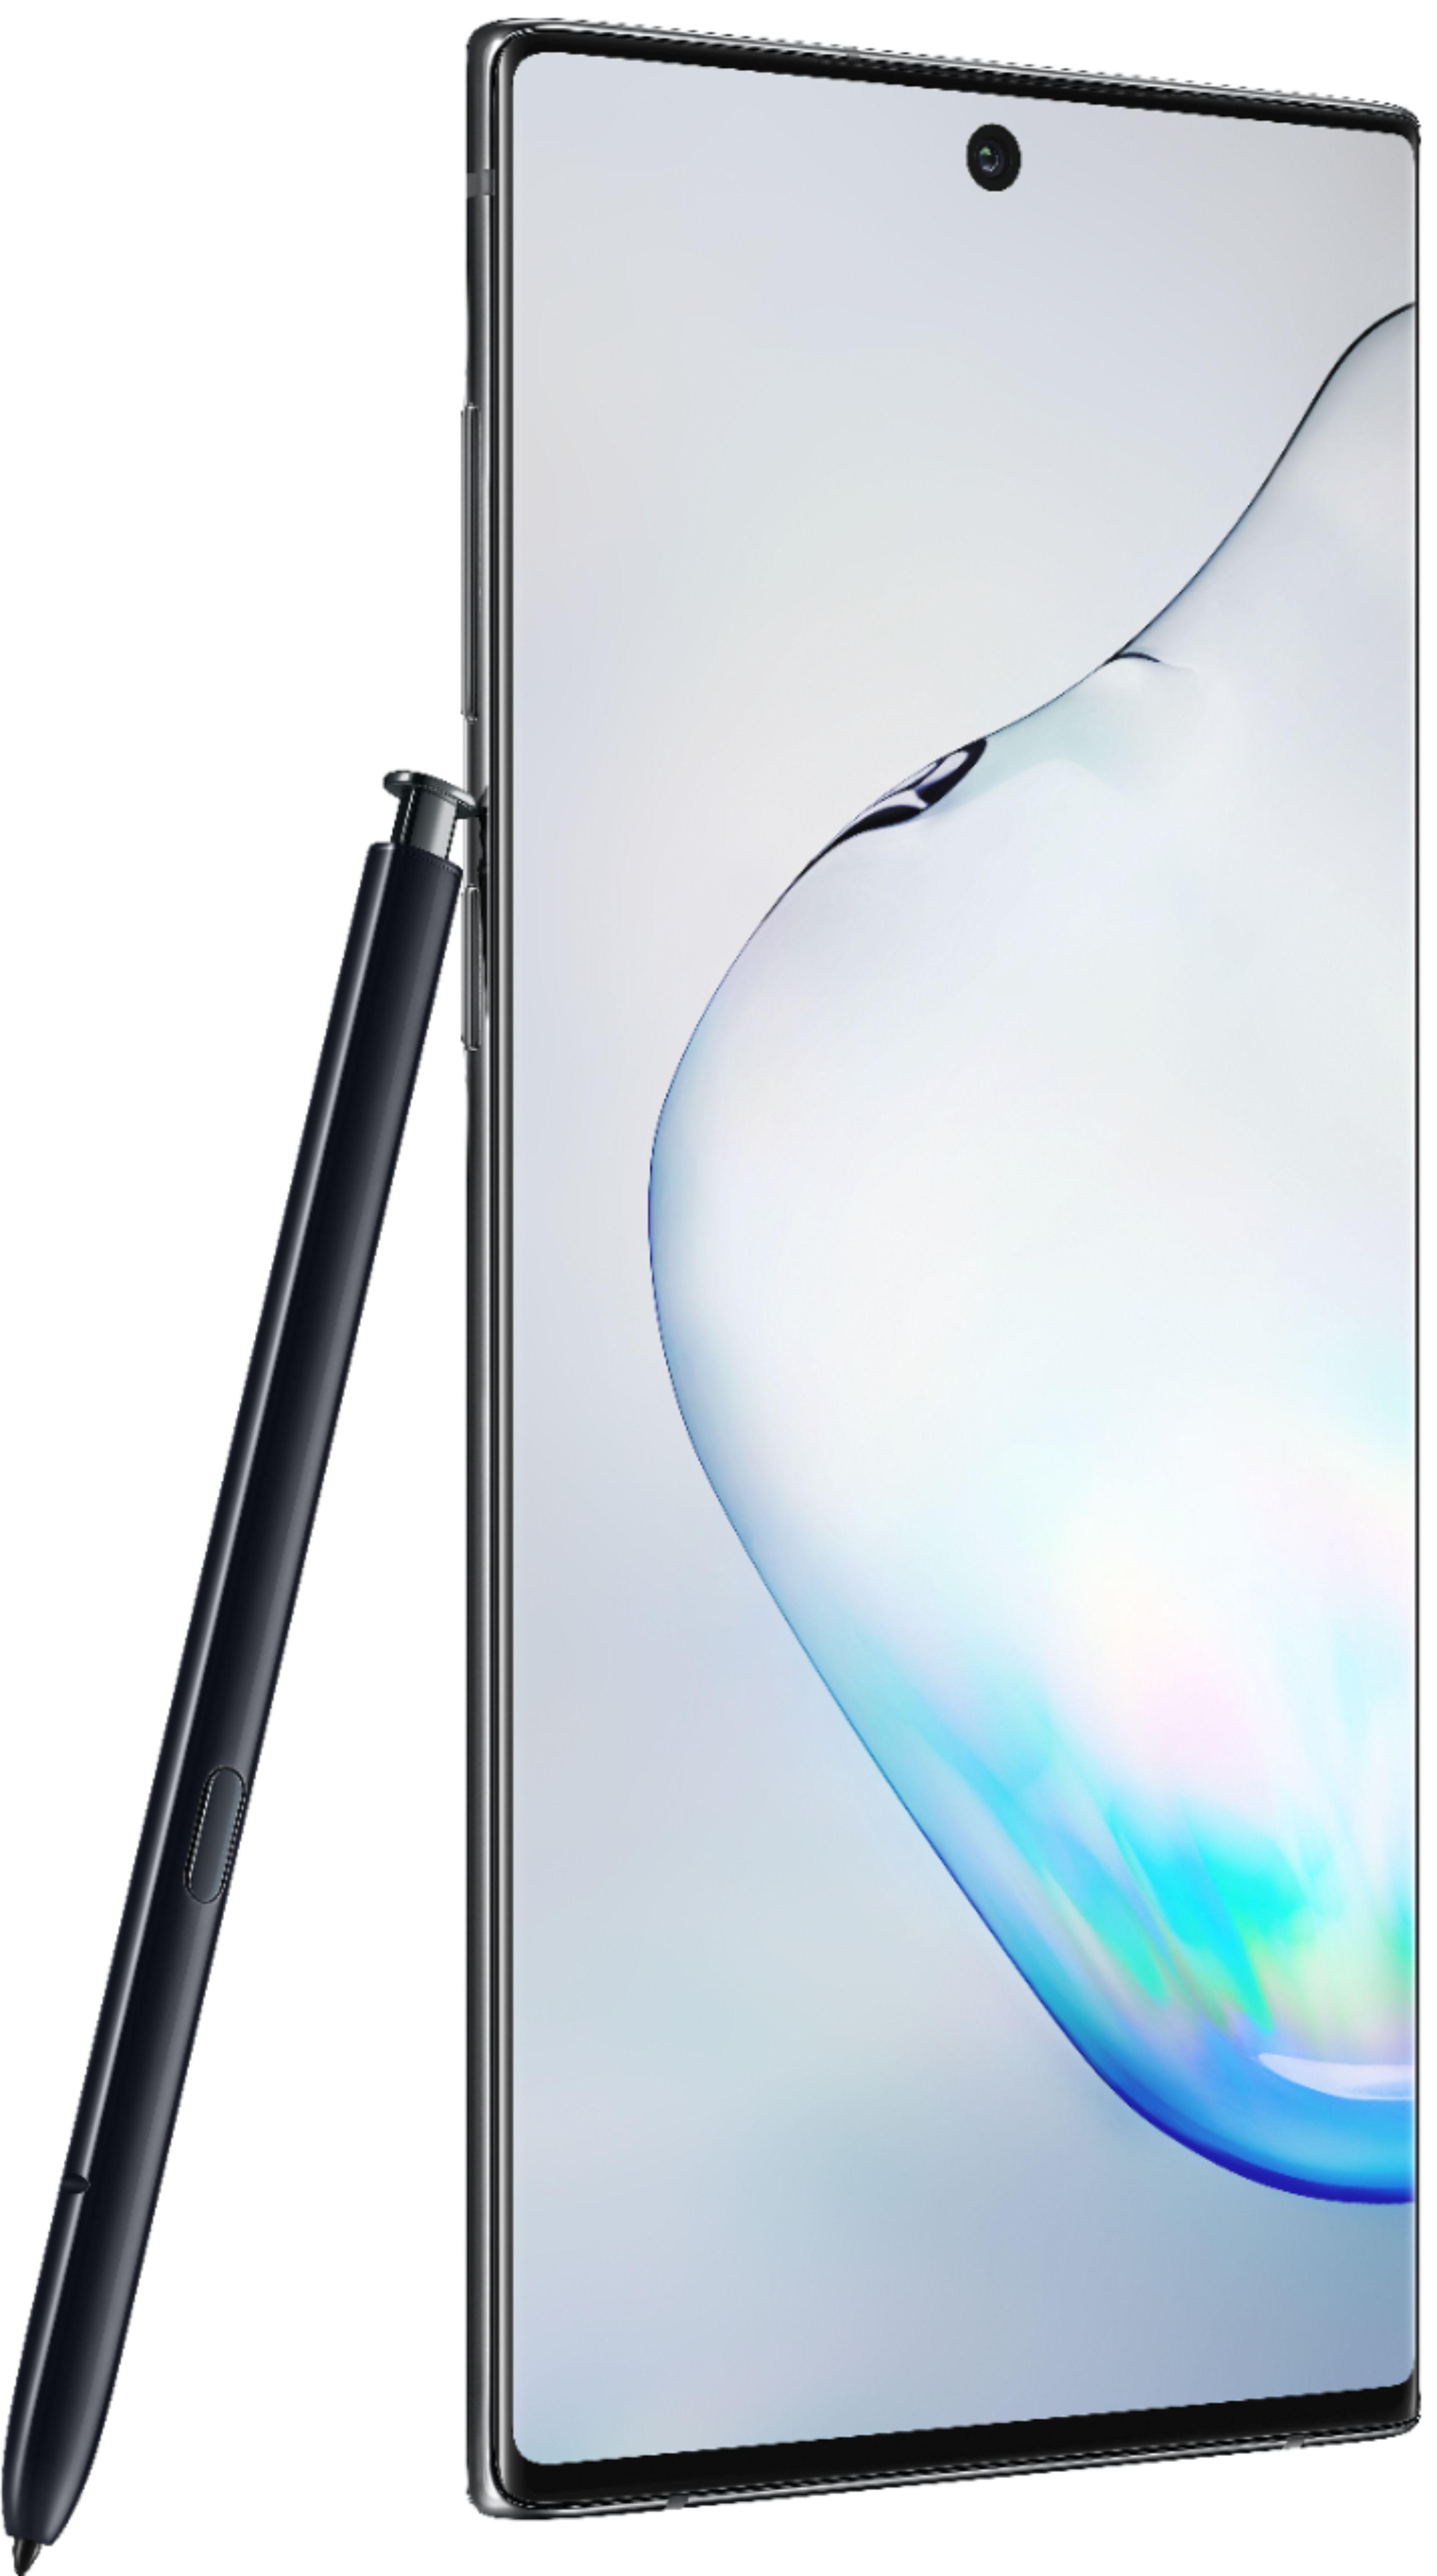 Samsung - Galaxy Note10 with 256GB Memory Cell Phone (Unlocked) - Aura Black $549.99 +fs $550